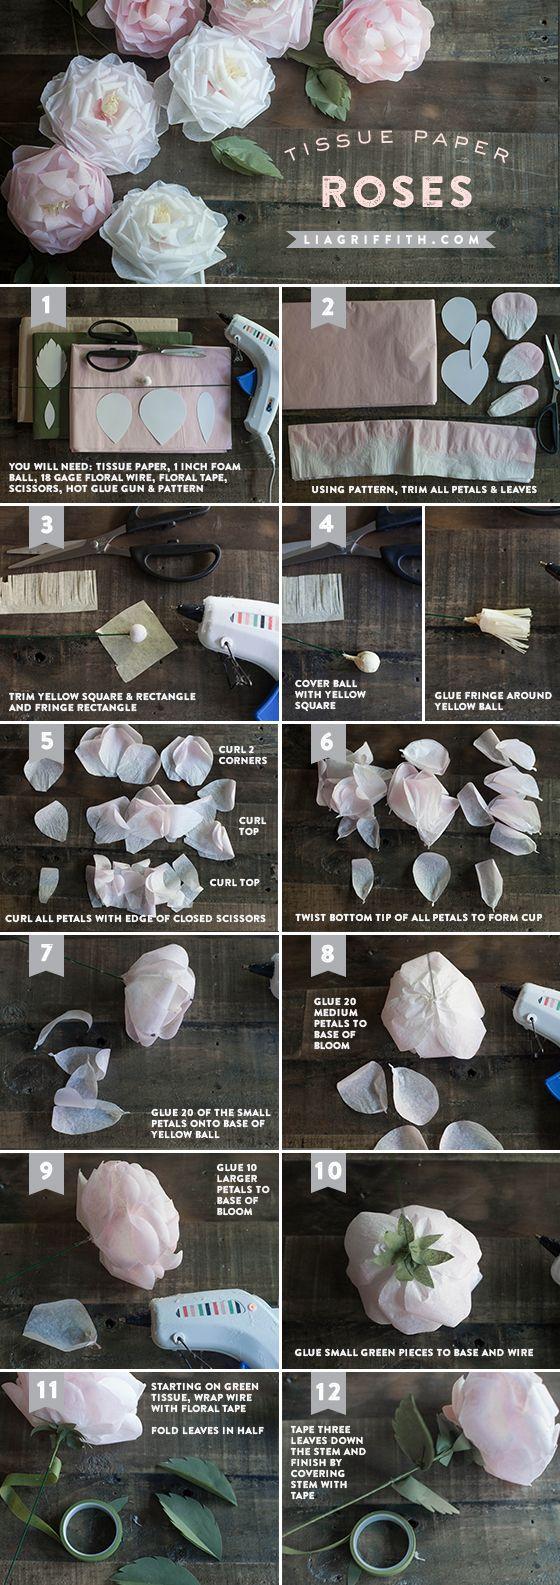 Make a tissue paper full bloom rose tissue paper roses paper